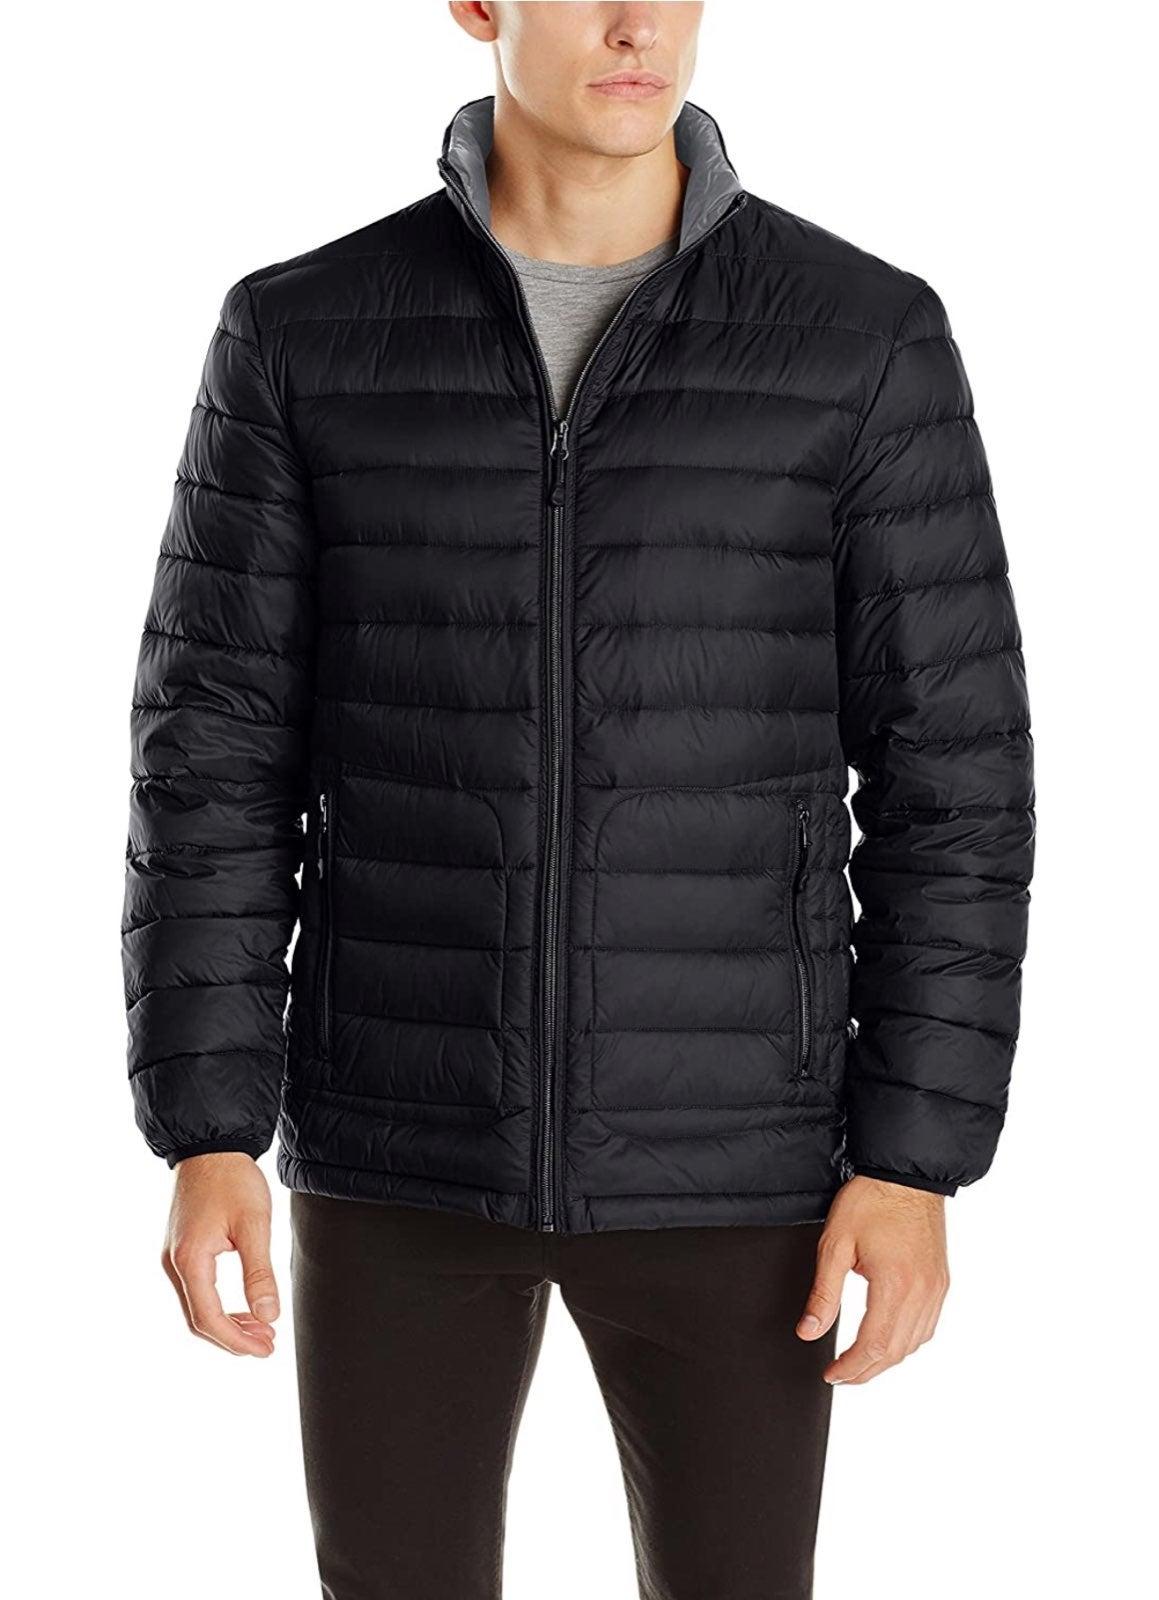 Buffalo David Bitton Black Puffer Jacket